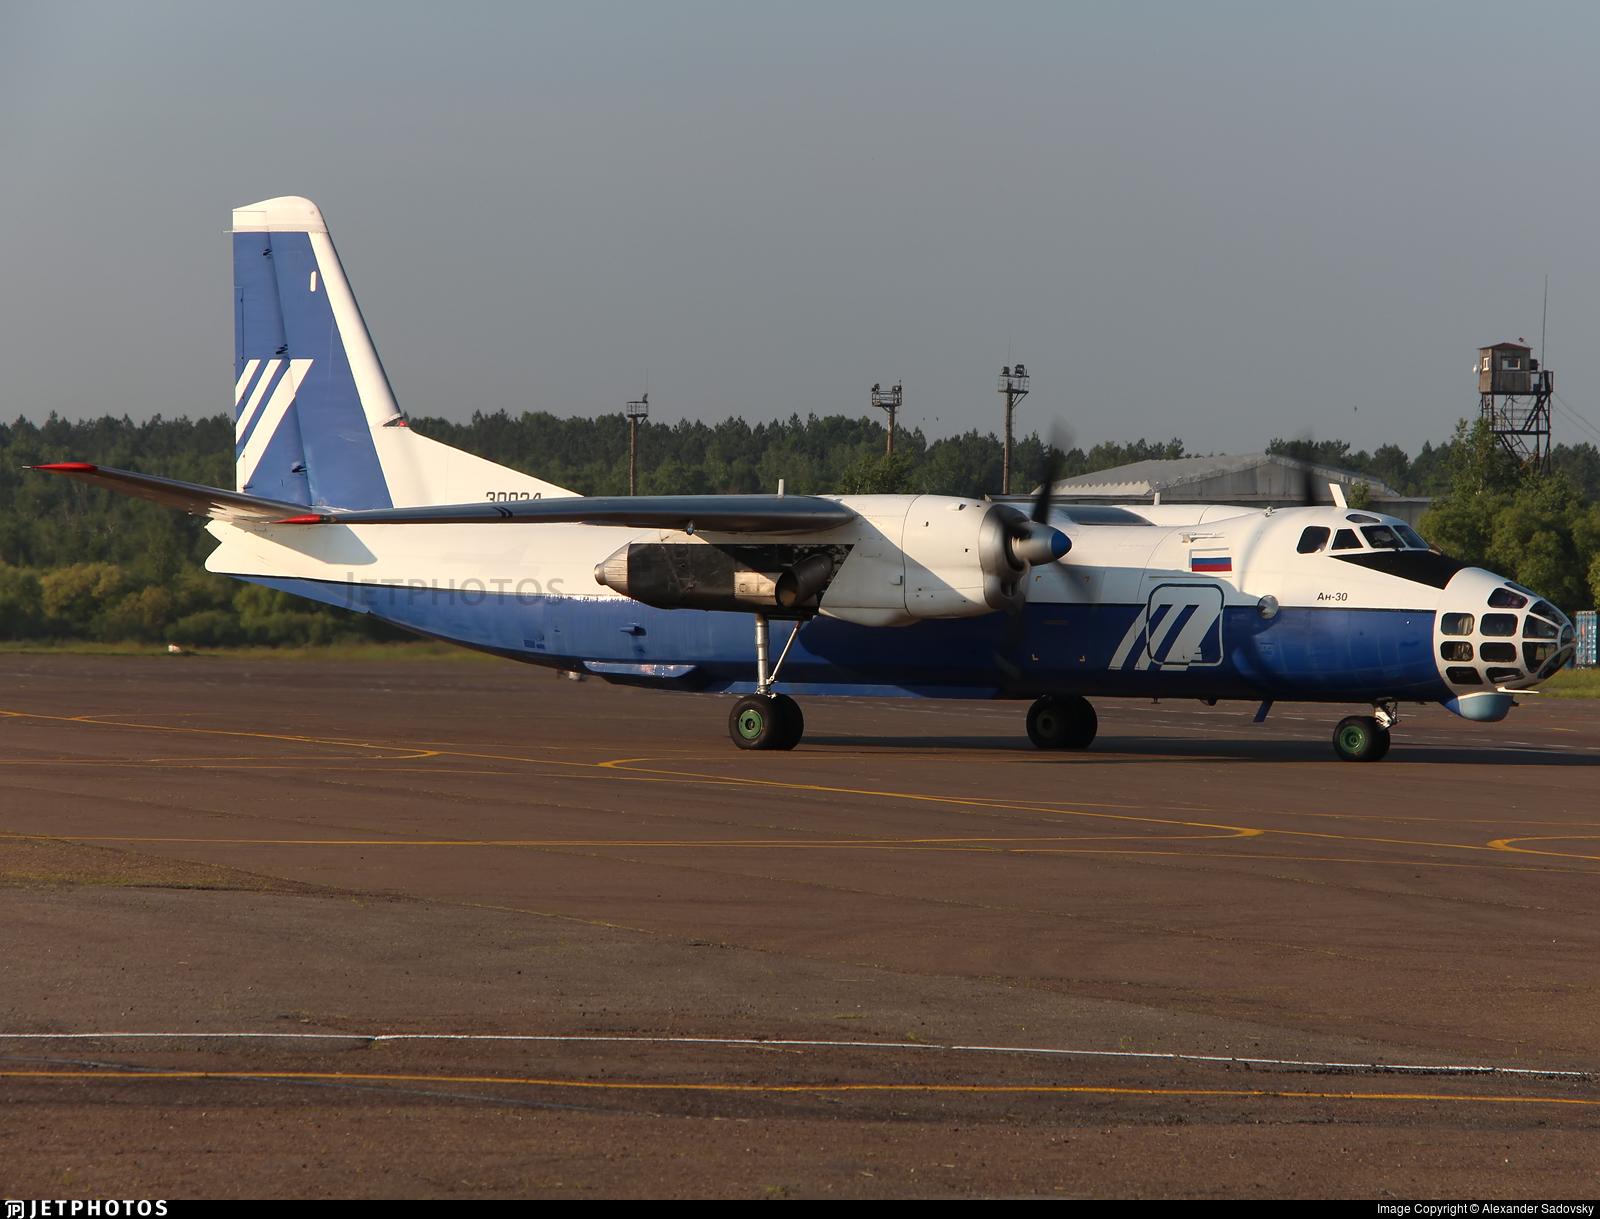 30024 - Antonov An-30 - Aerostroy